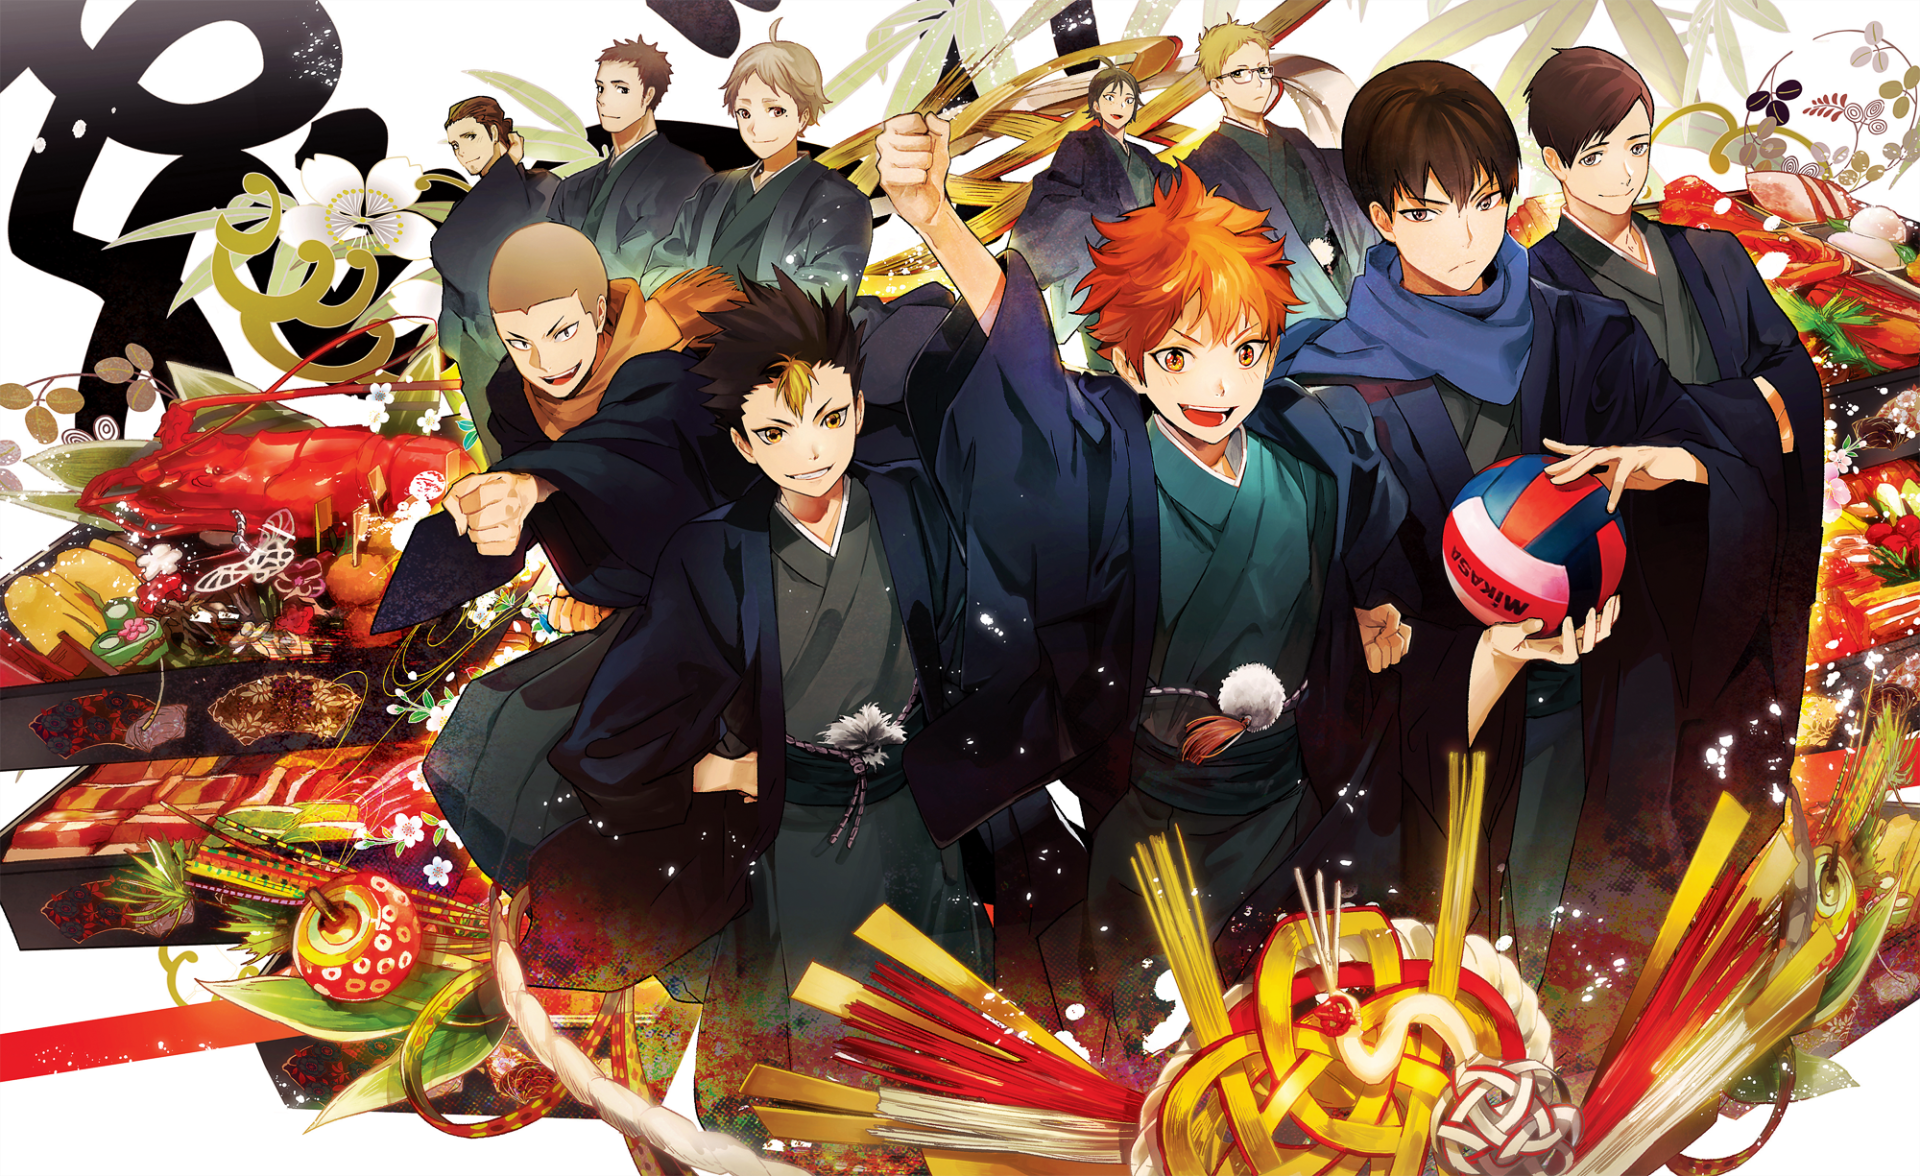 Haikyu!! HD Wallpaper | Background Image | 2000x1225 | ID:692747